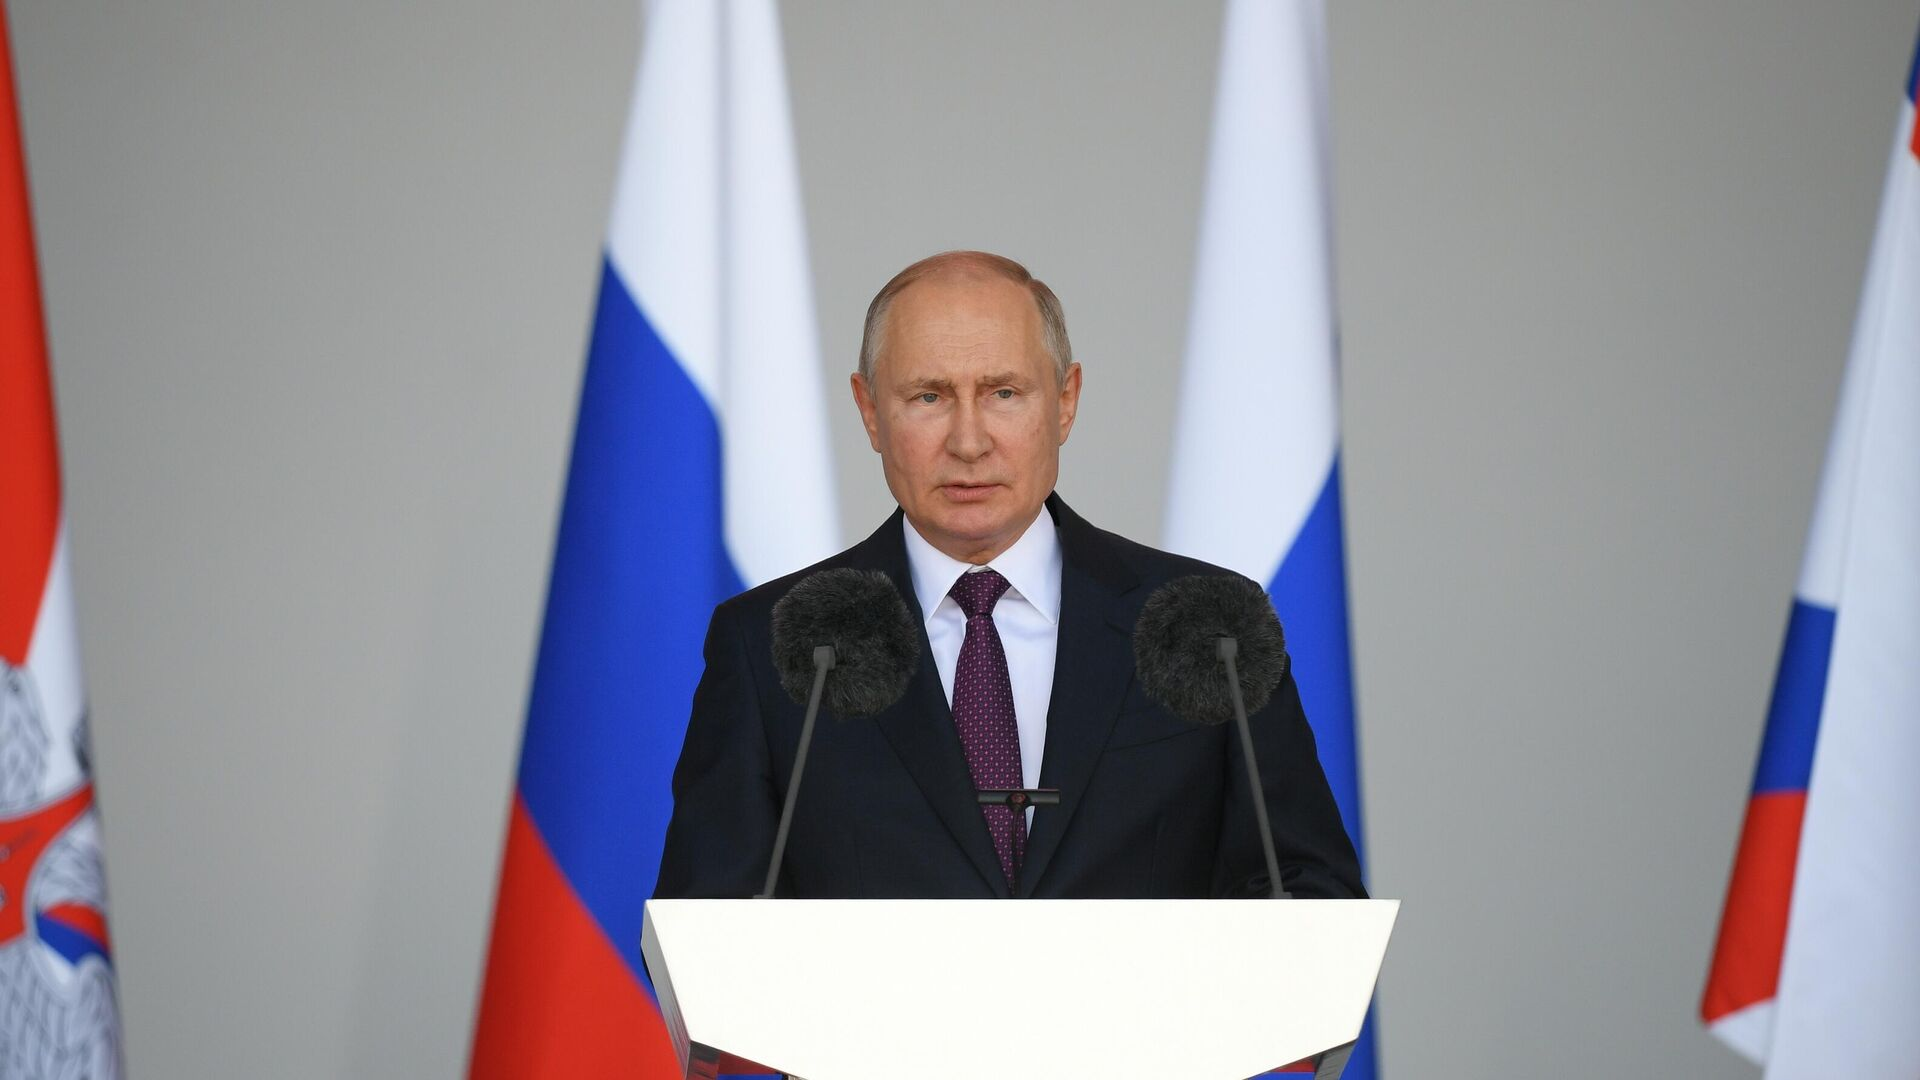 Vladímir Putin, presidente de Rusia - Sputnik Mundo, 1920, 23.08.2021